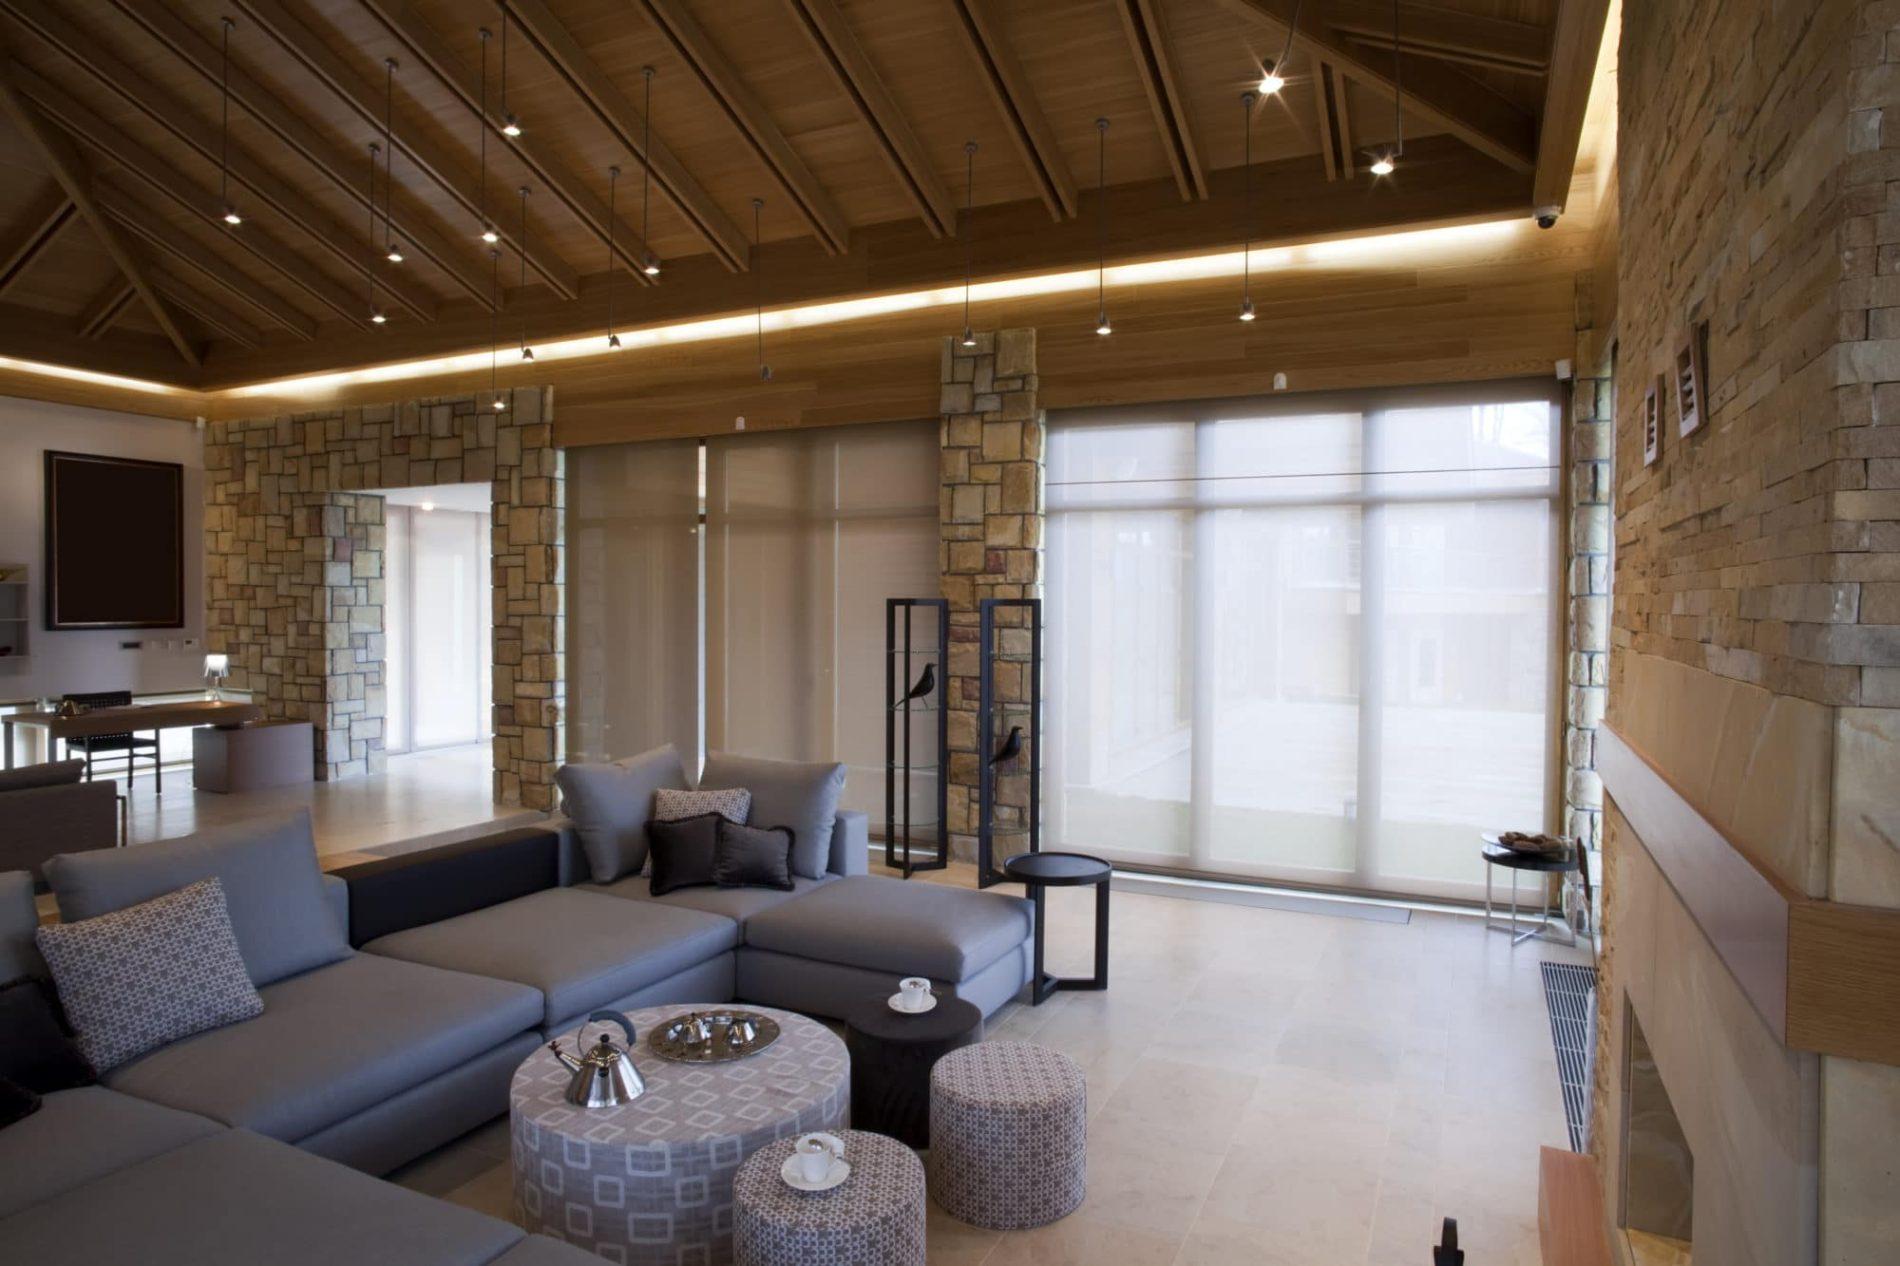 Kamenné obložení interiéru